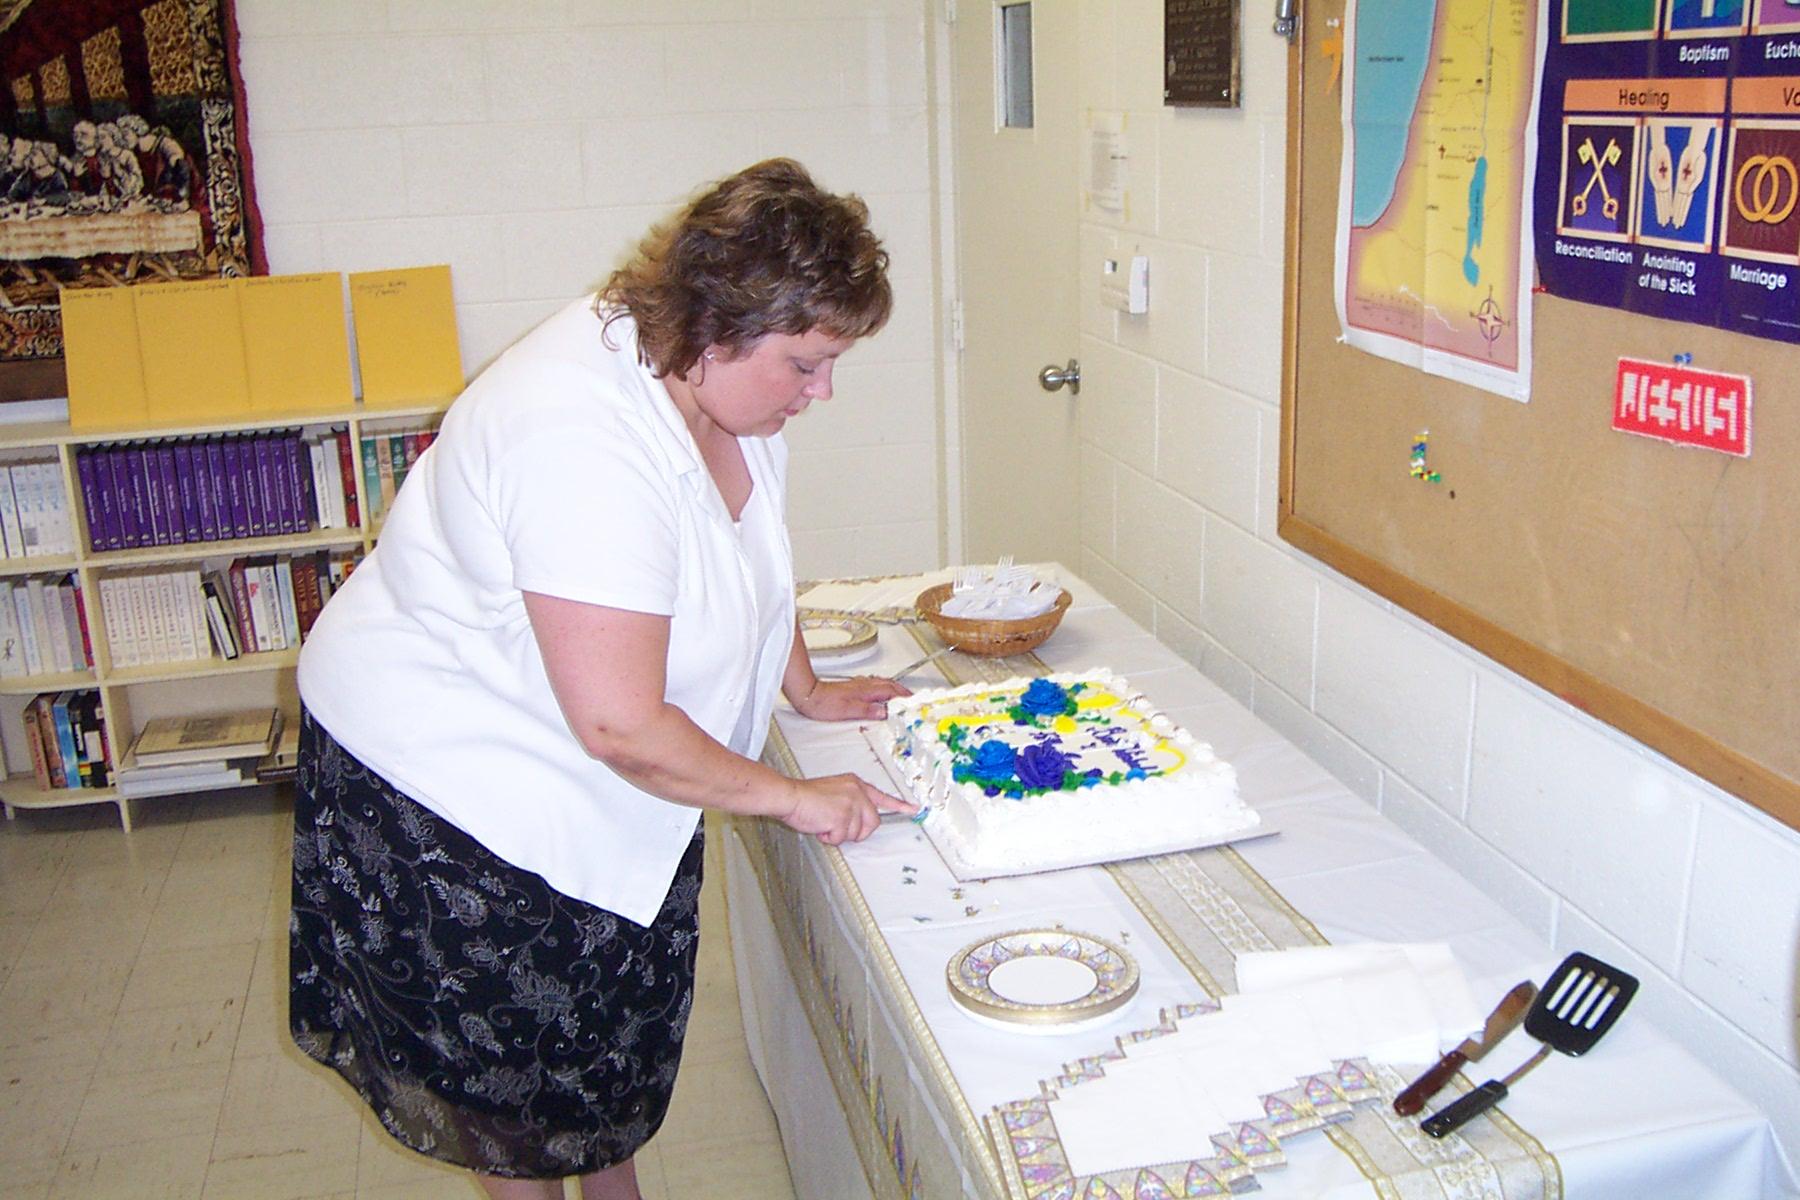 Mary Beth Redding cuts the cake - 2008-06-29 001